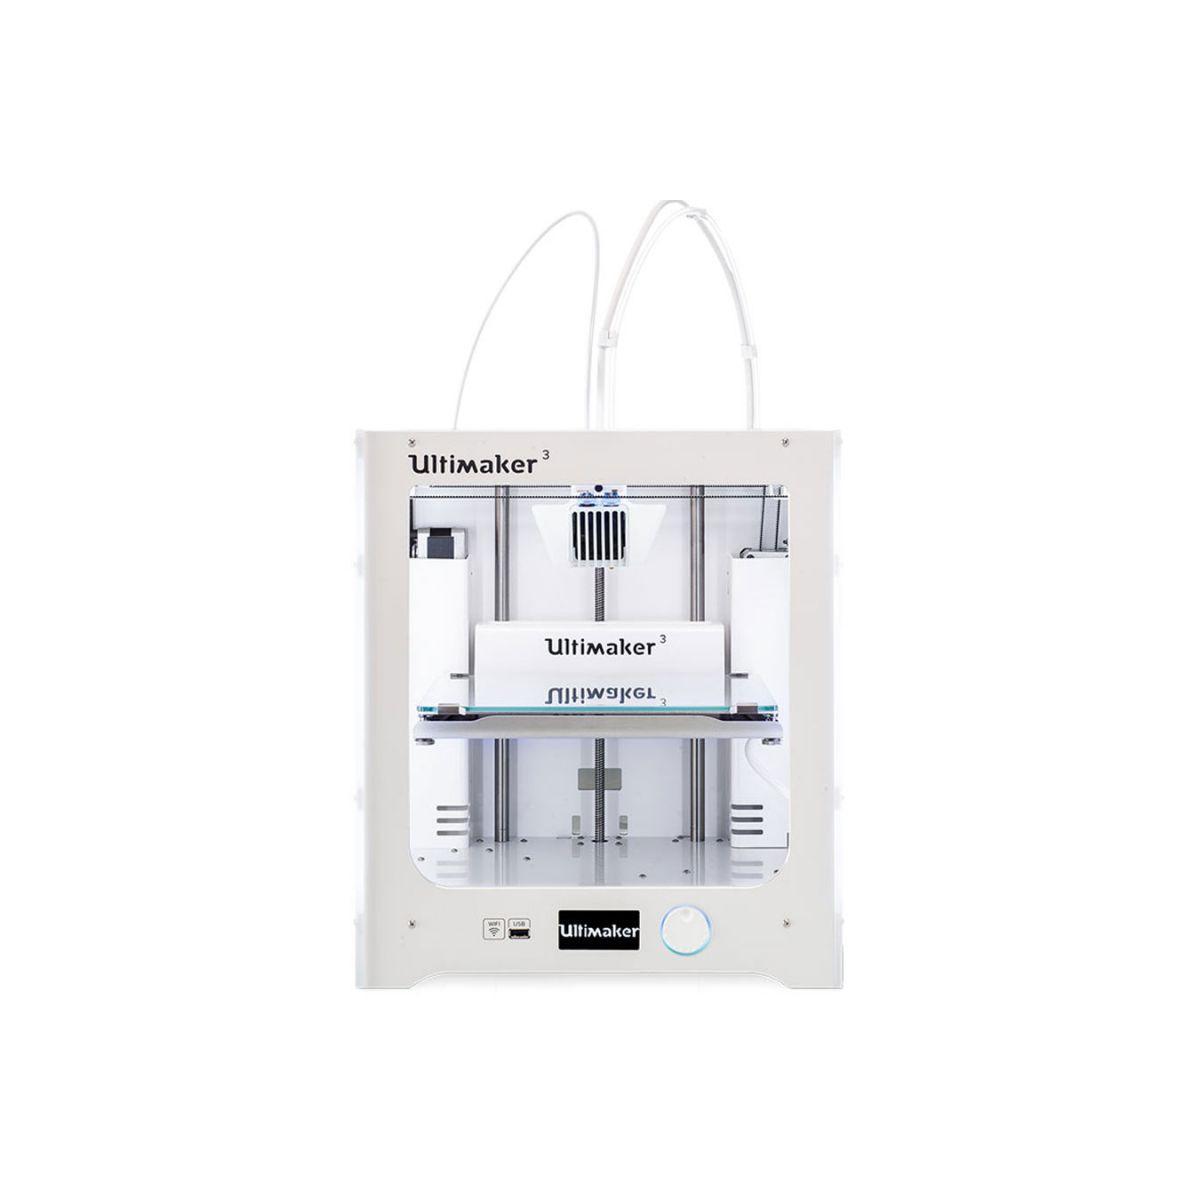 Imprimante 3d ultimaker 3 (photo)